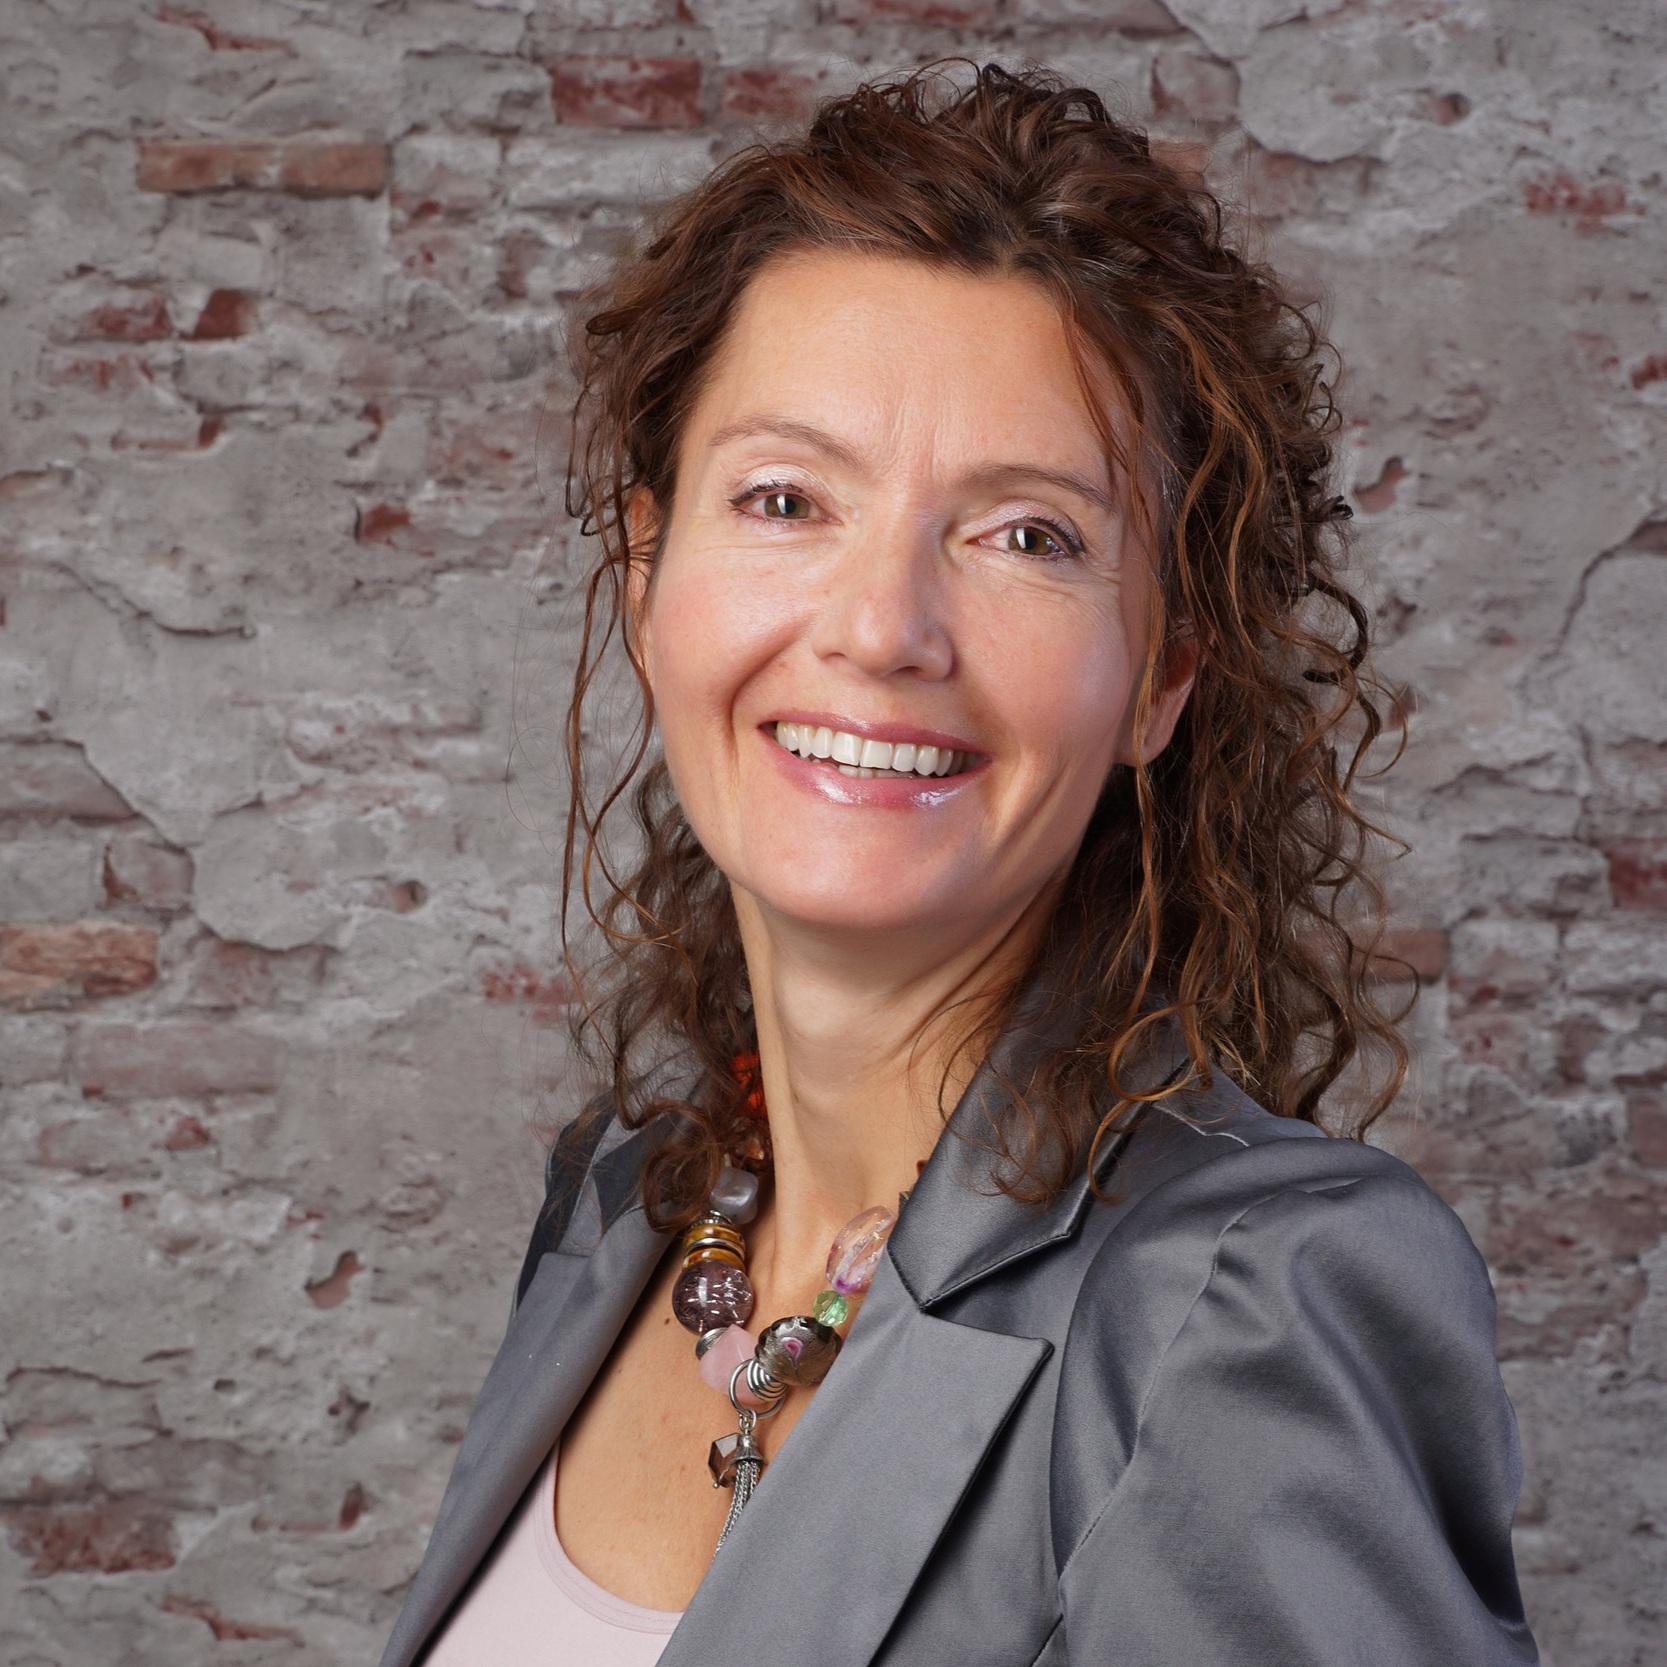 Adelka-Vendl-provocatief-psycholoog